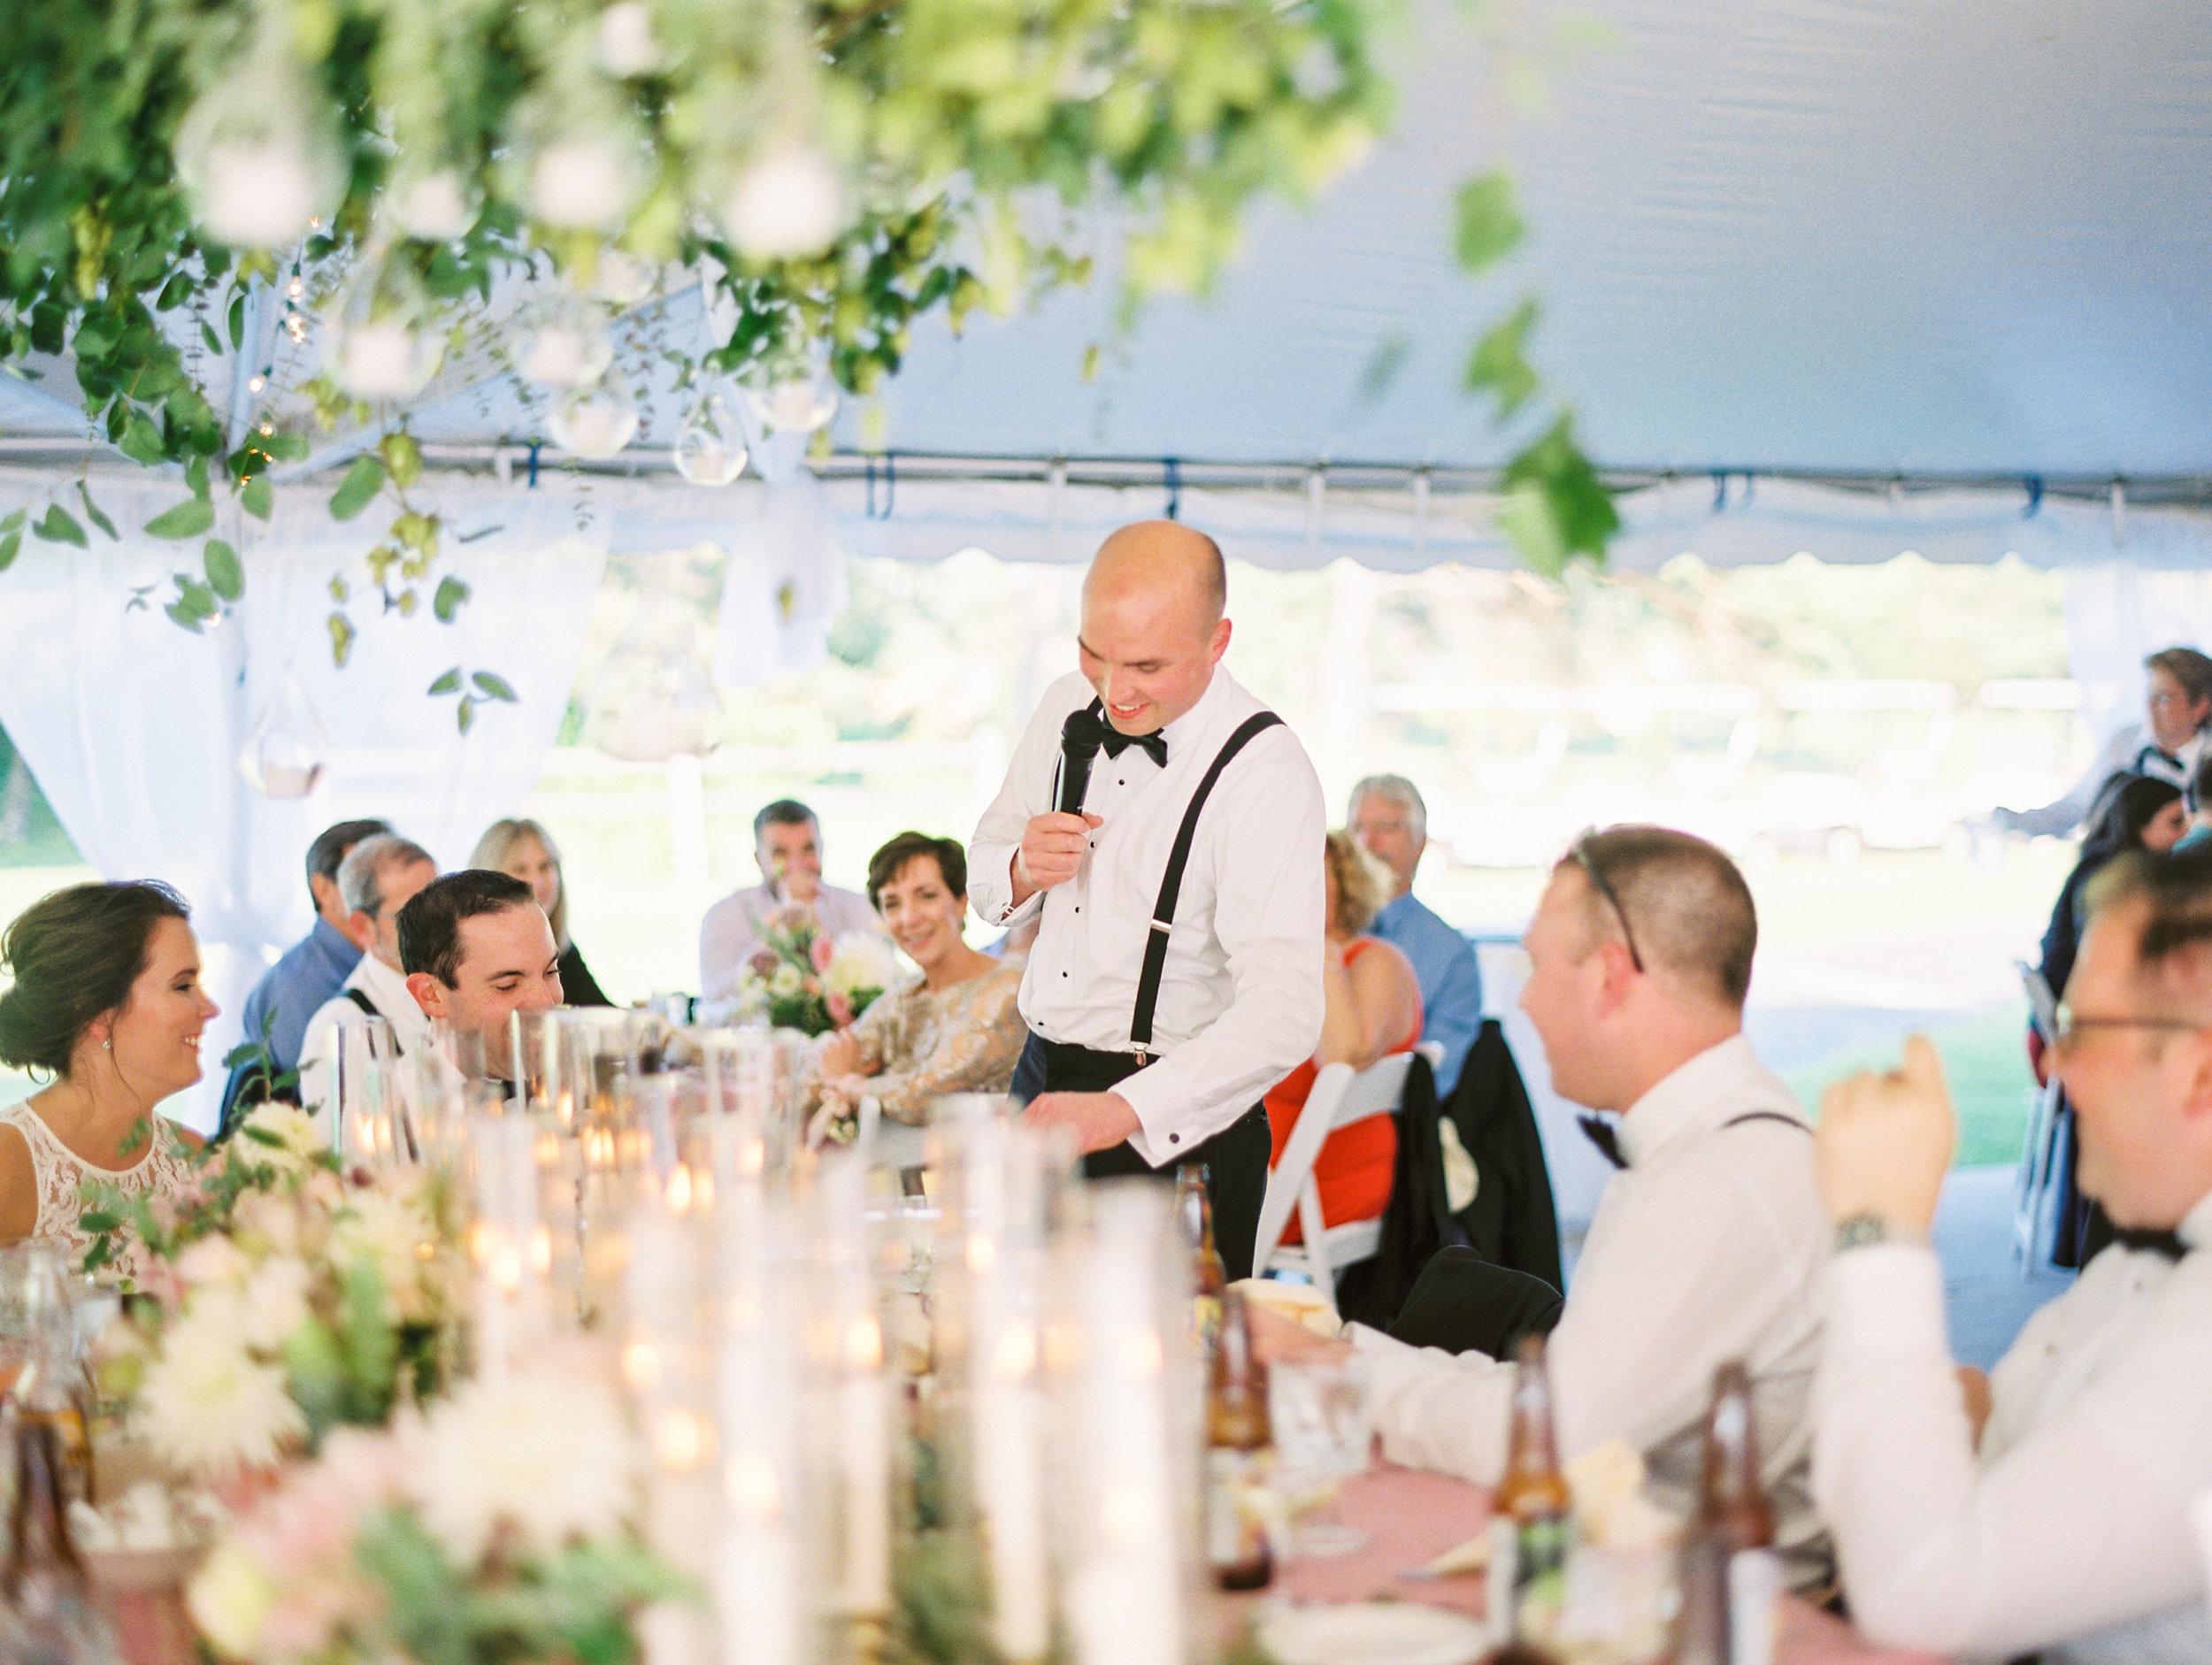 Zoller+Wedding+Reception+Toasts-96.jpg